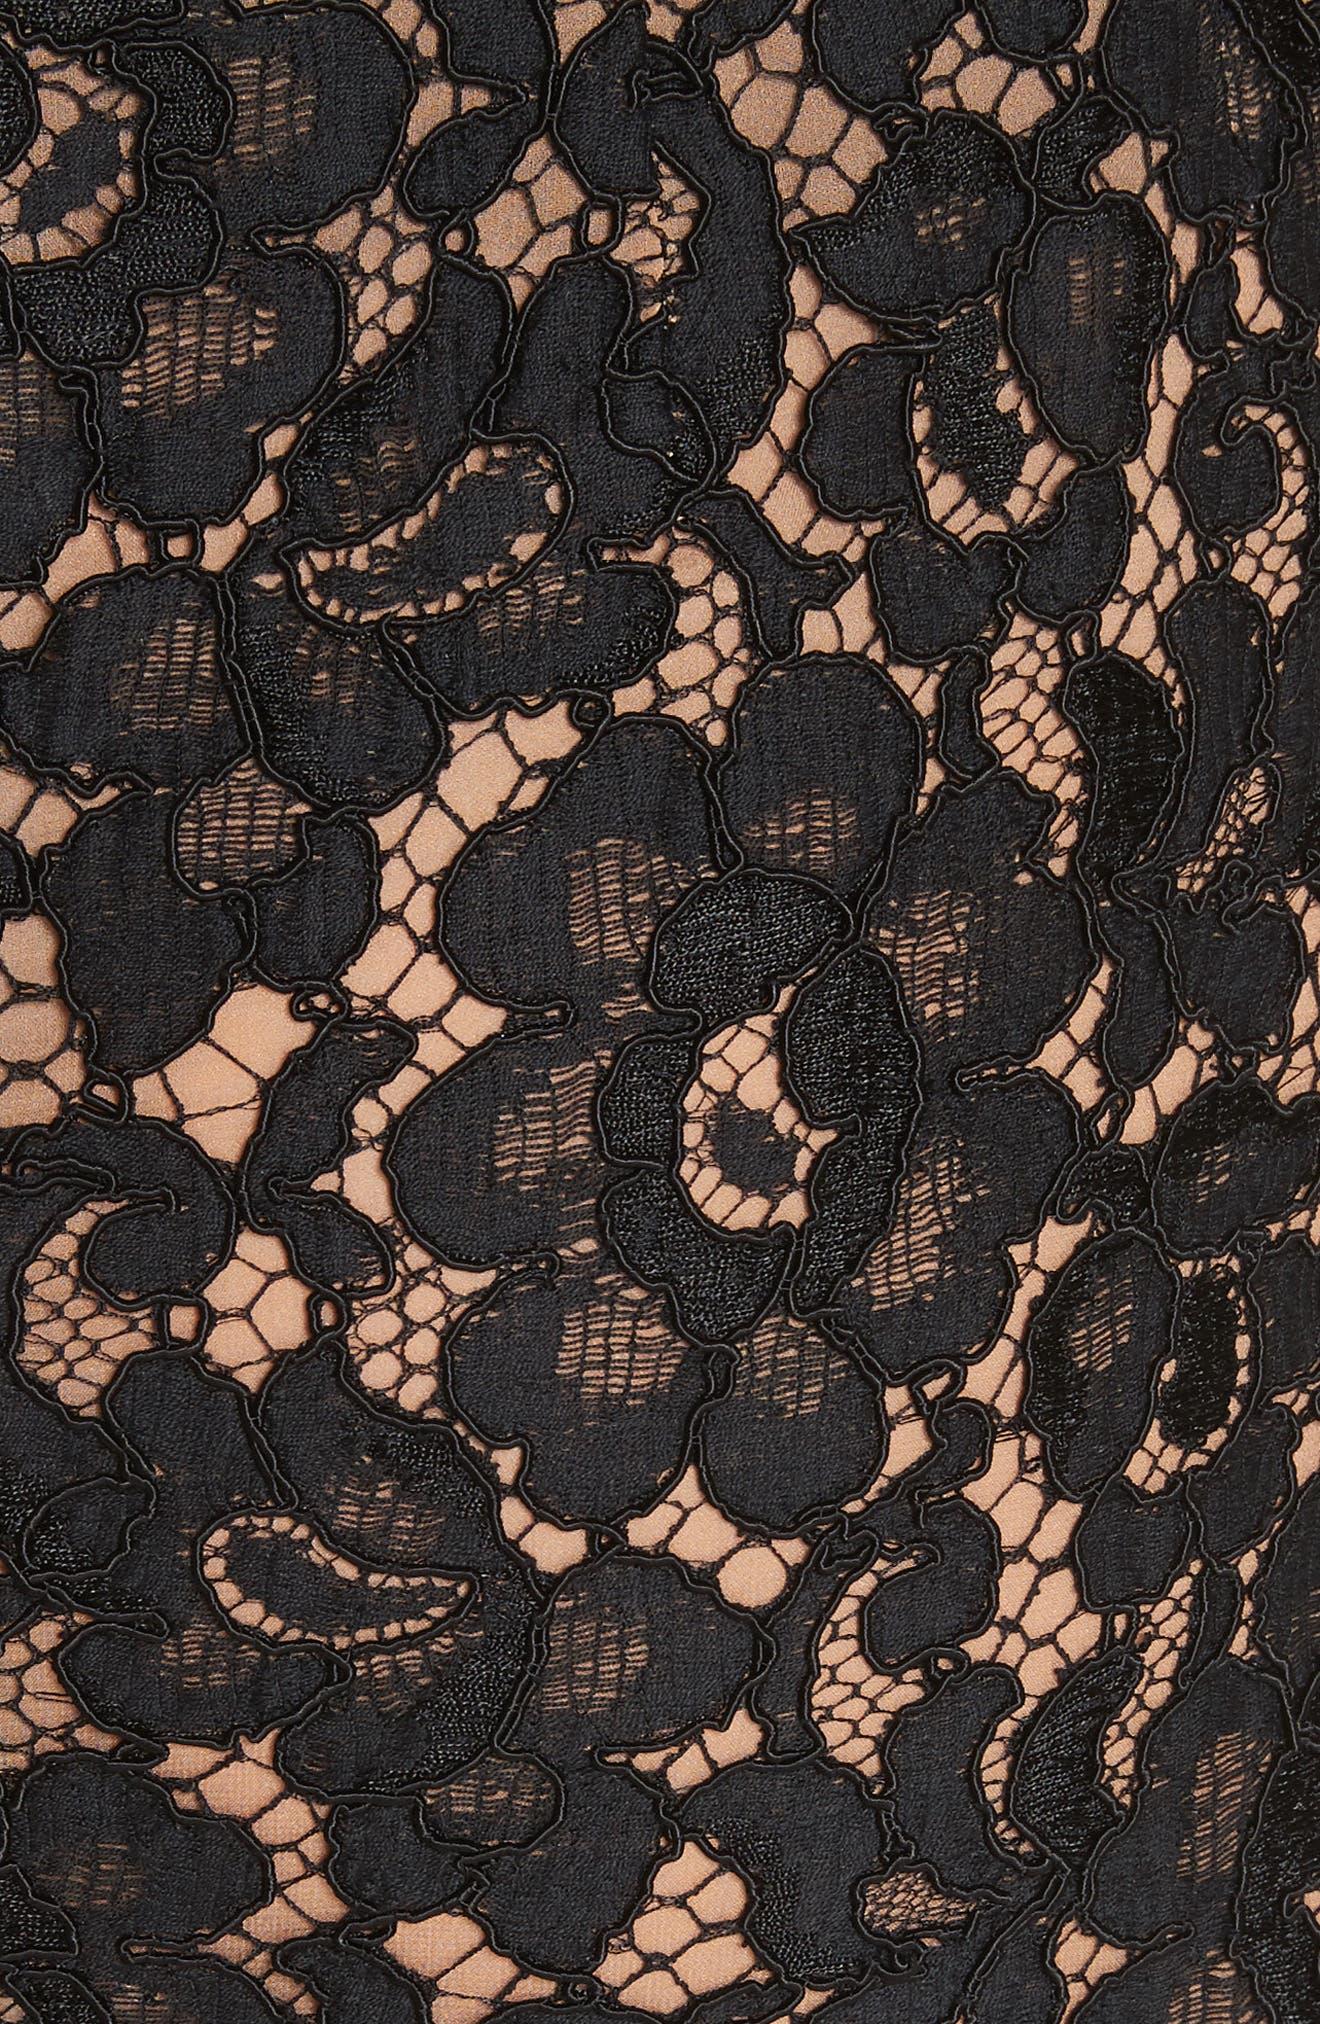 Lace Pencil Skirt,                             Alternate thumbnail 5, color,                             BLACK